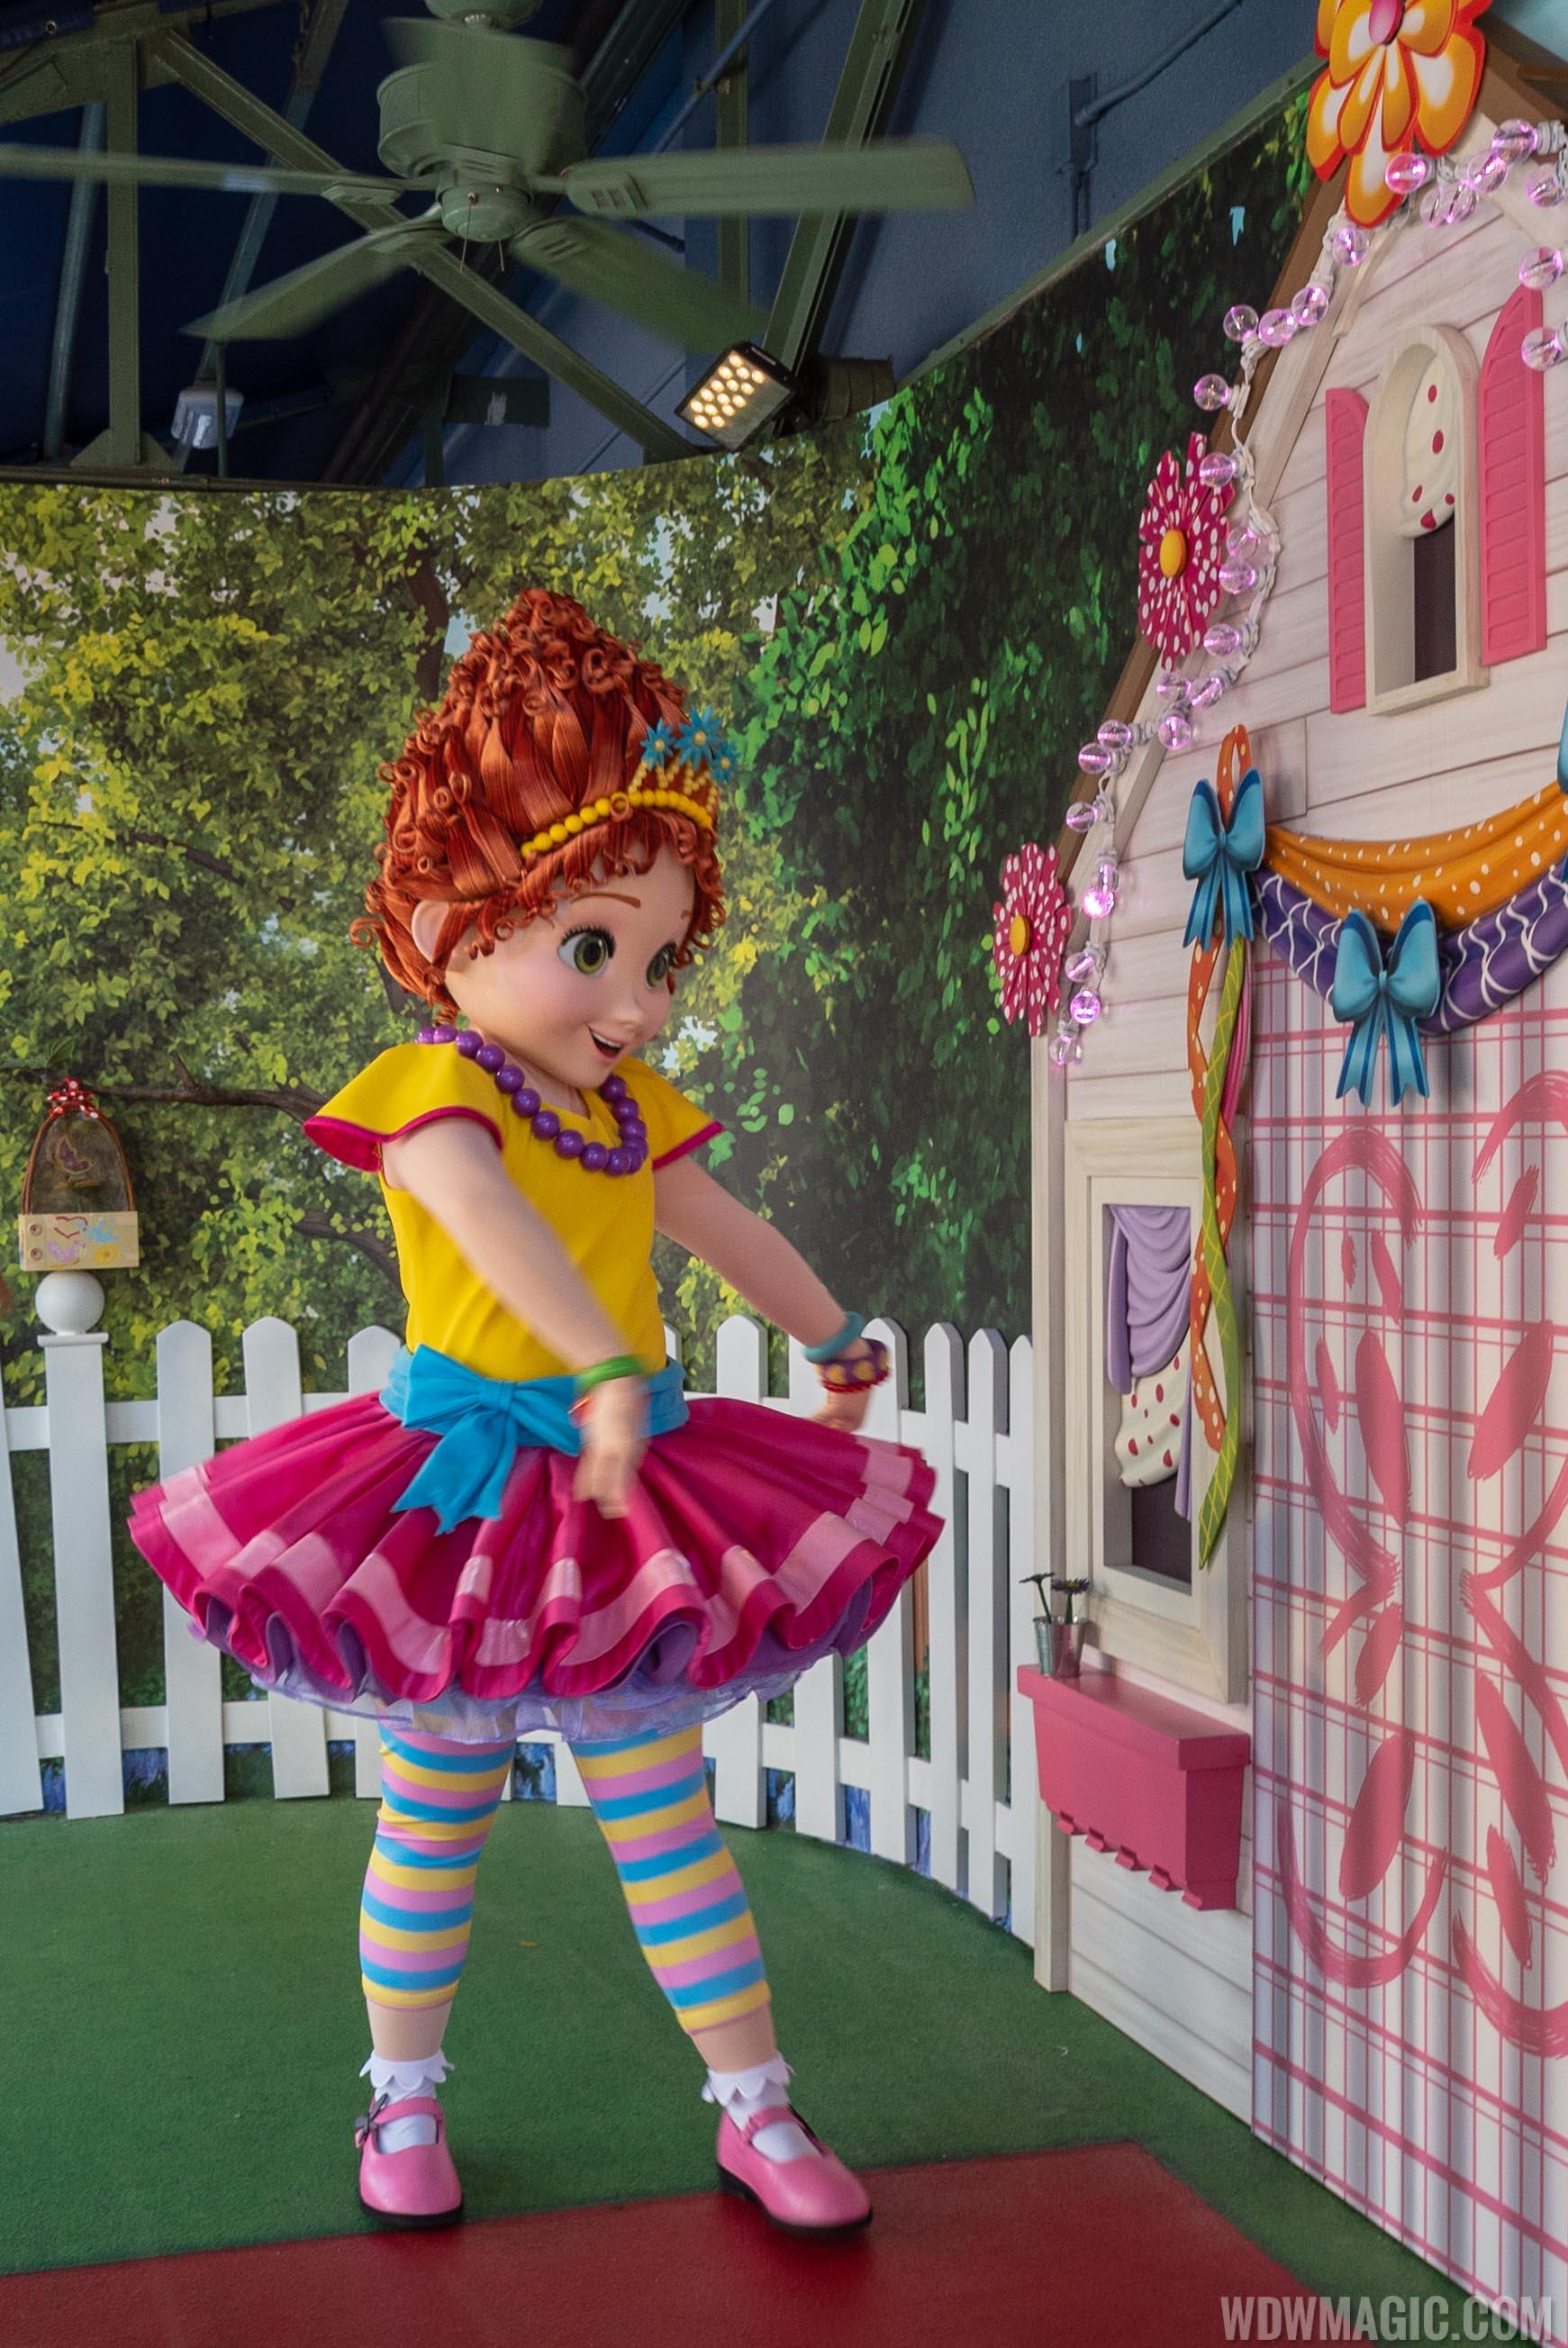 Fancy Nancy character meet and greet at Disney's Hollywood Studios